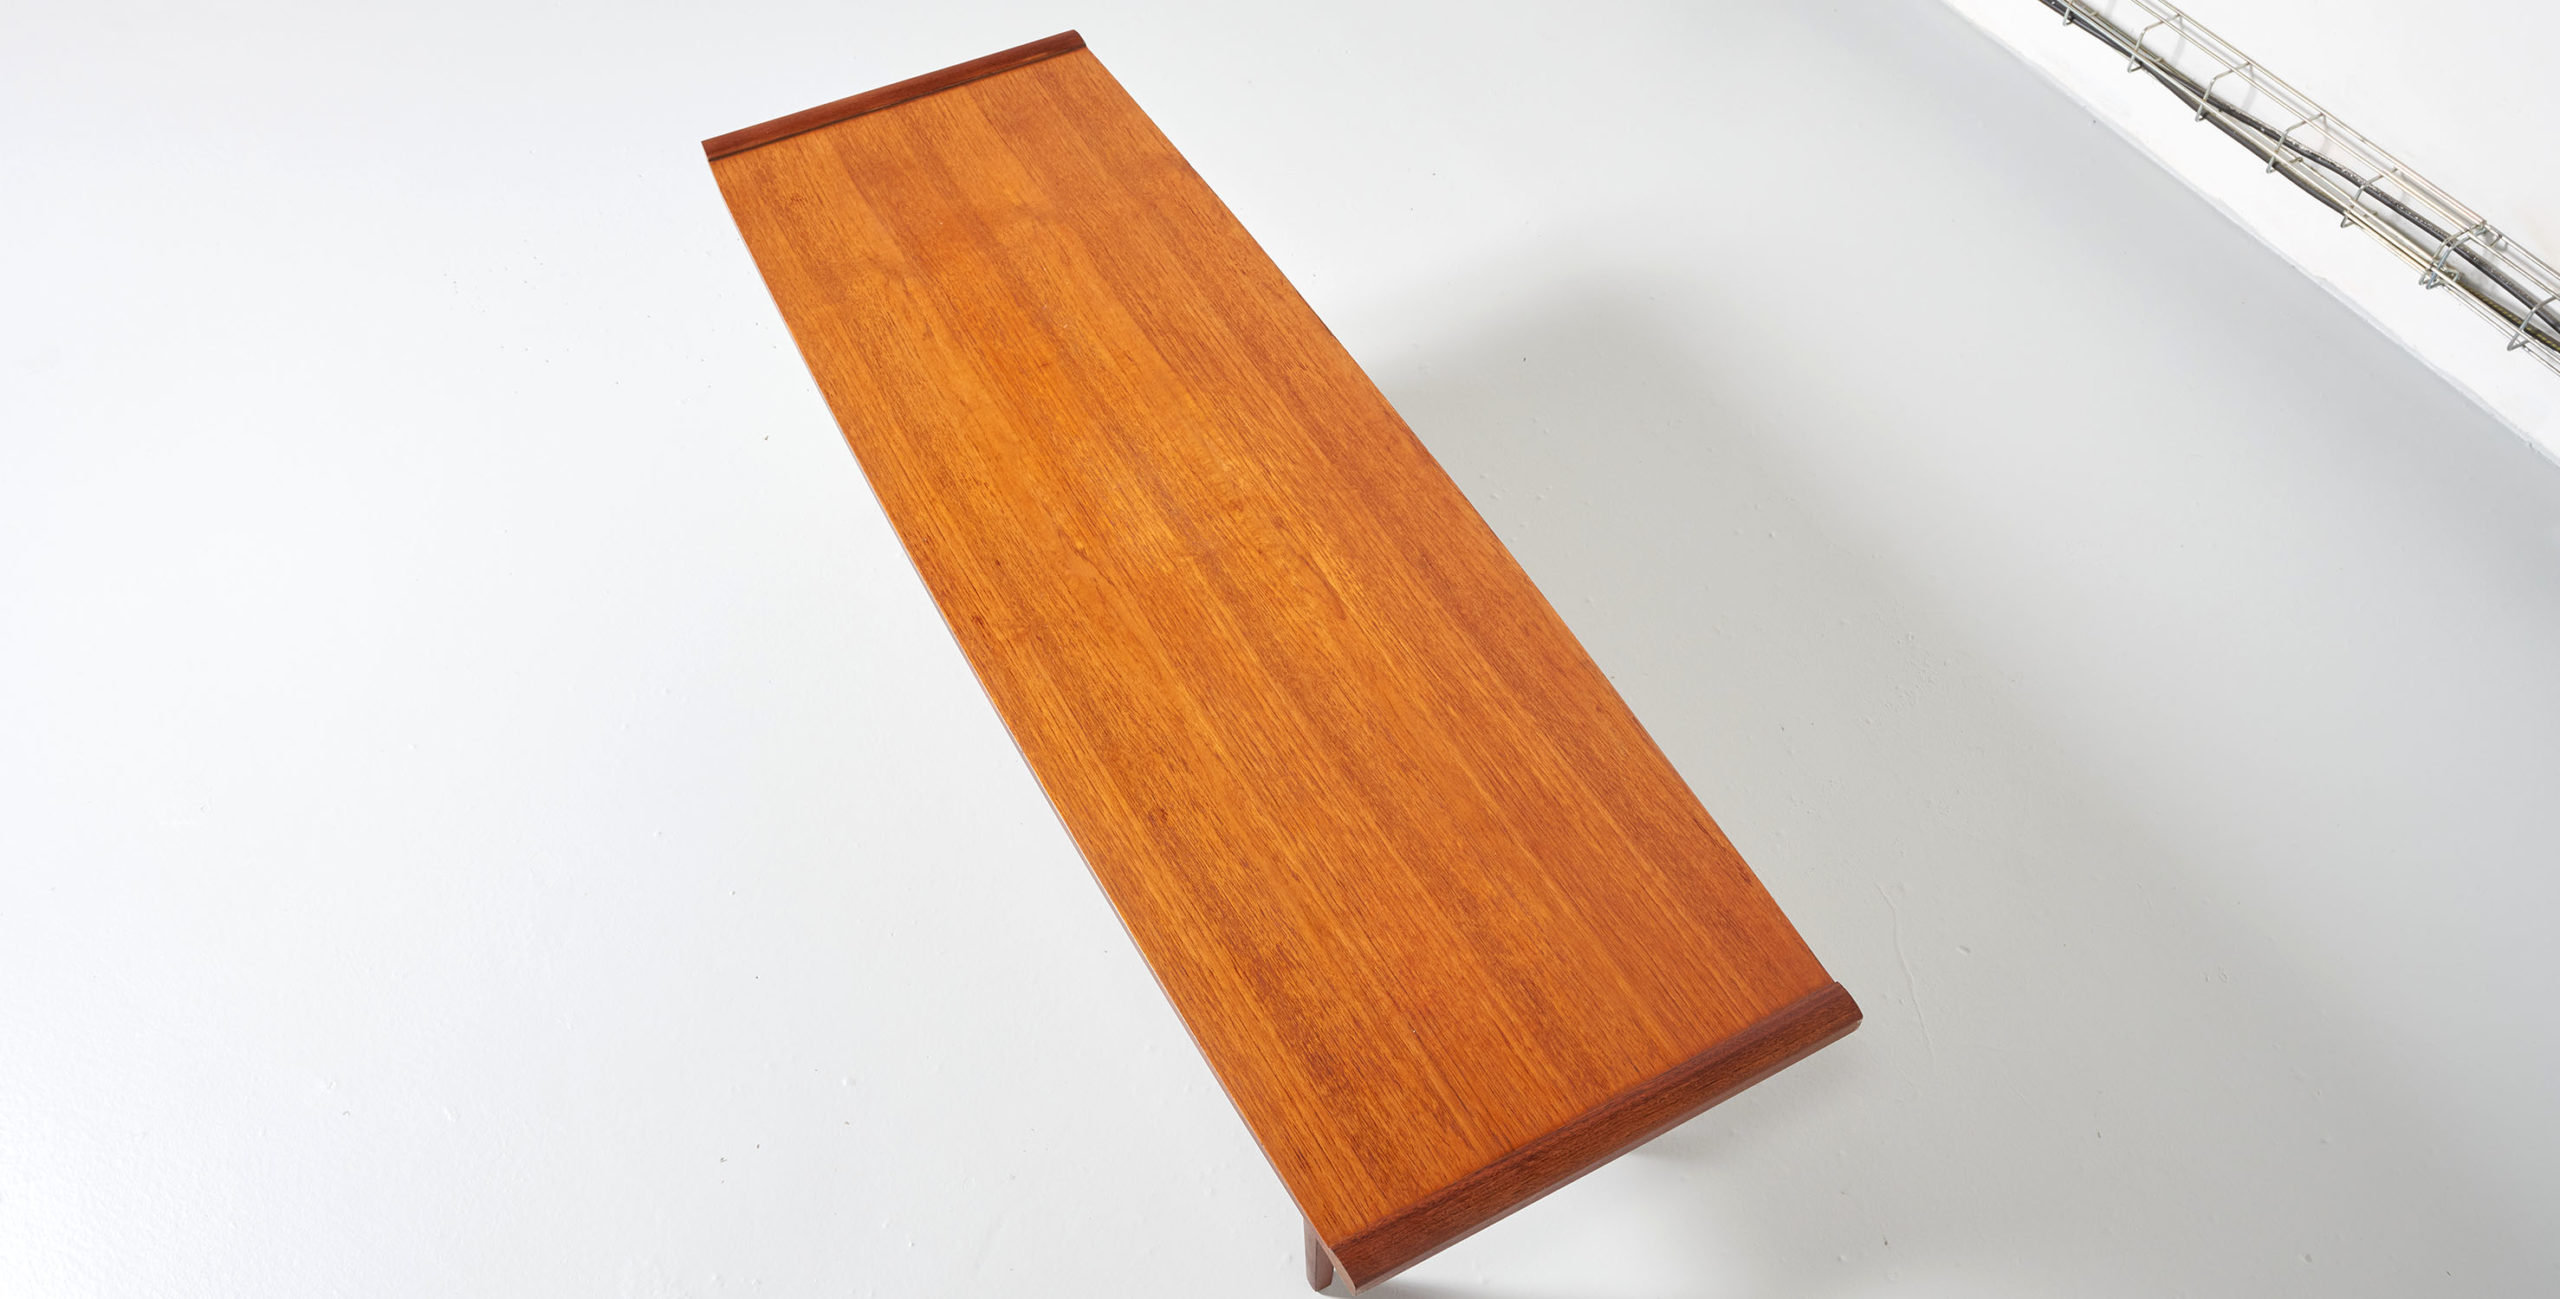 table basse teck vintage, table basse avec porte revues, table basse avec porte magazine, table basse vintage, table basse g plan, table basse porte revues vintage, table basse anglaise, table basse anglaise vintage